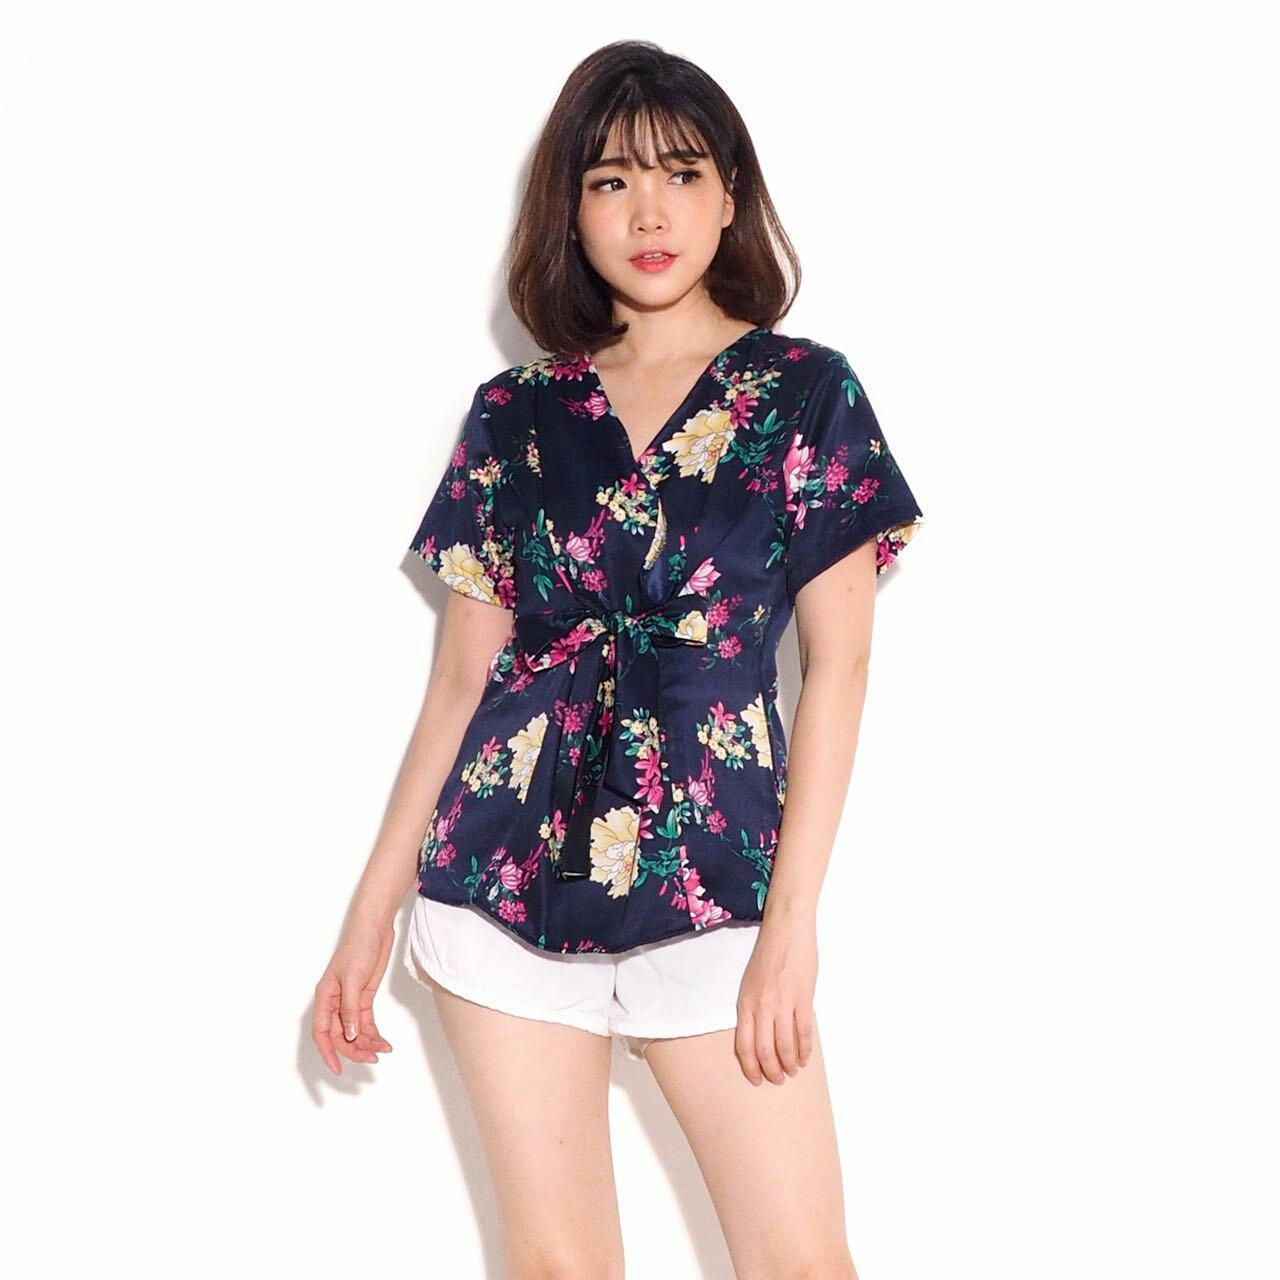 Liliana Baju Kemeja Wanita Fashion Terbaru